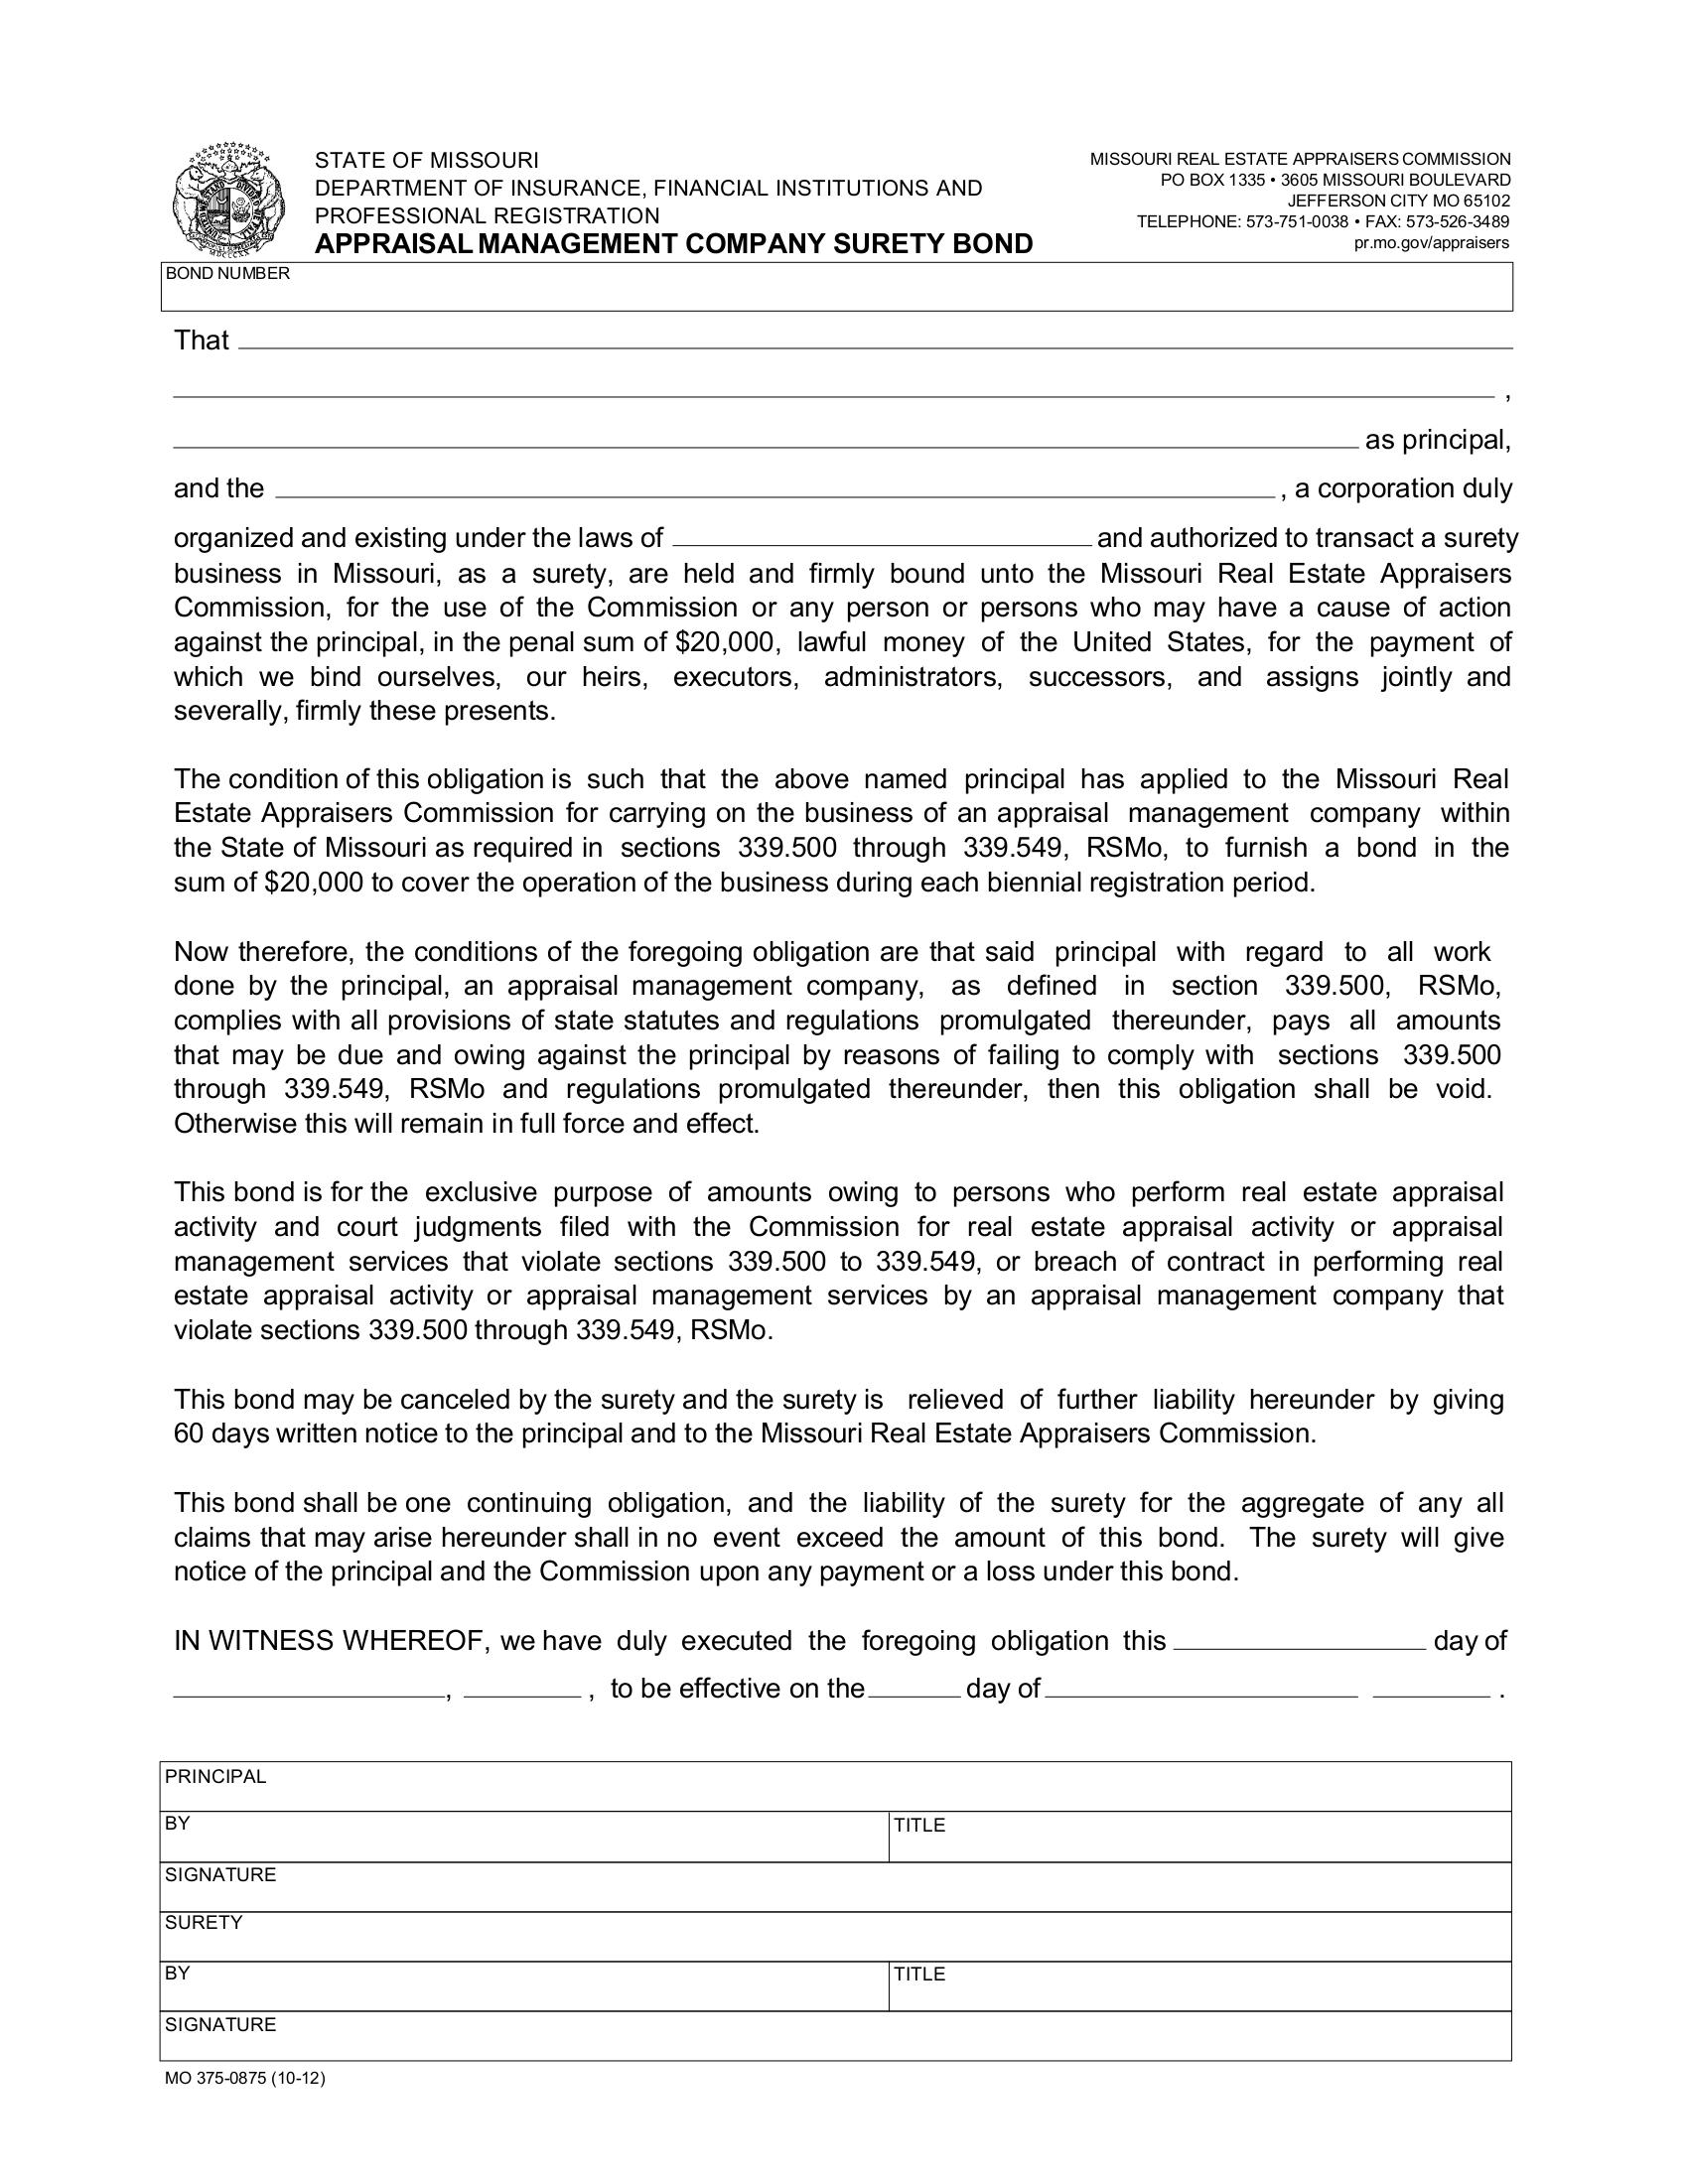 Appraisal Management Company Bond sample image